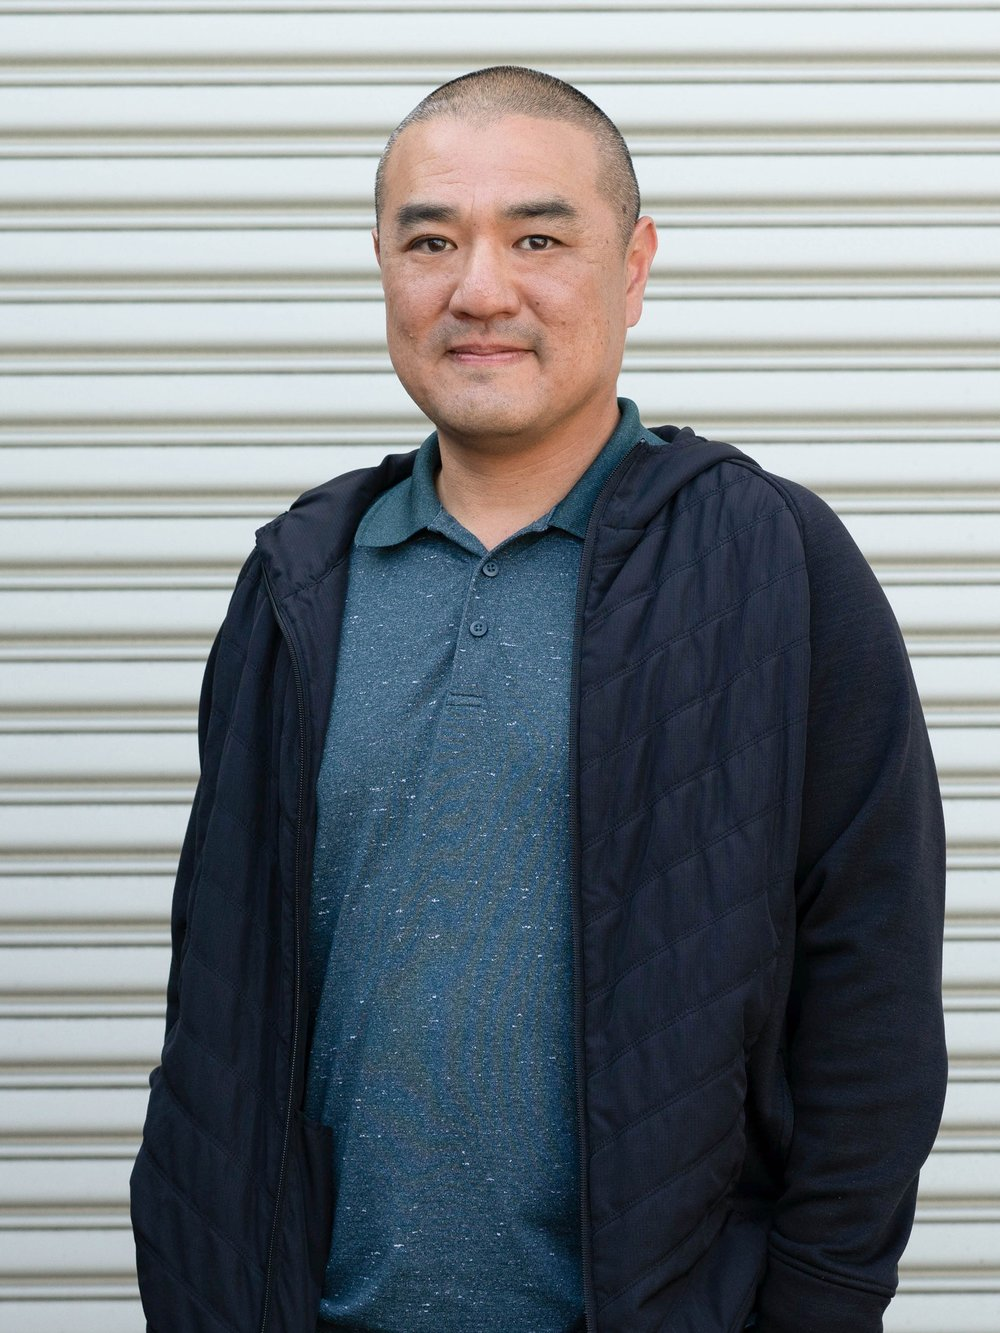 DAVID KANG - Director, Finance